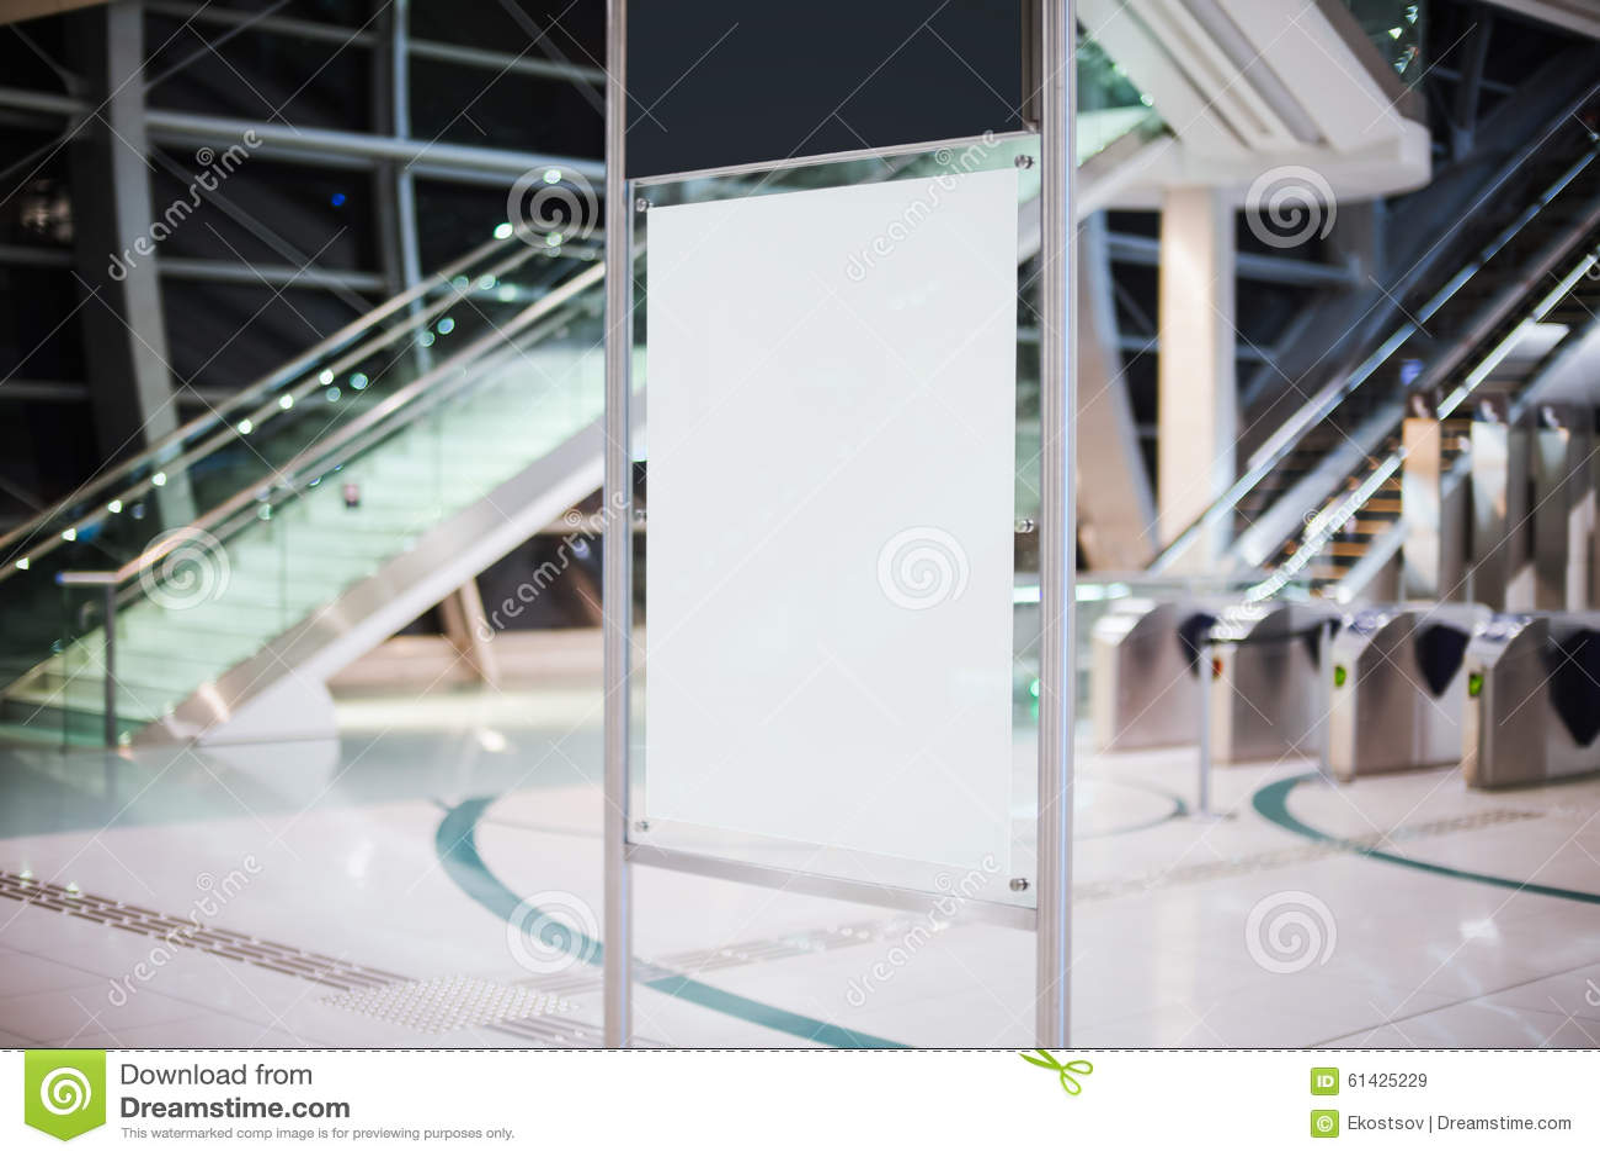 Pusty biały billboard w metrze